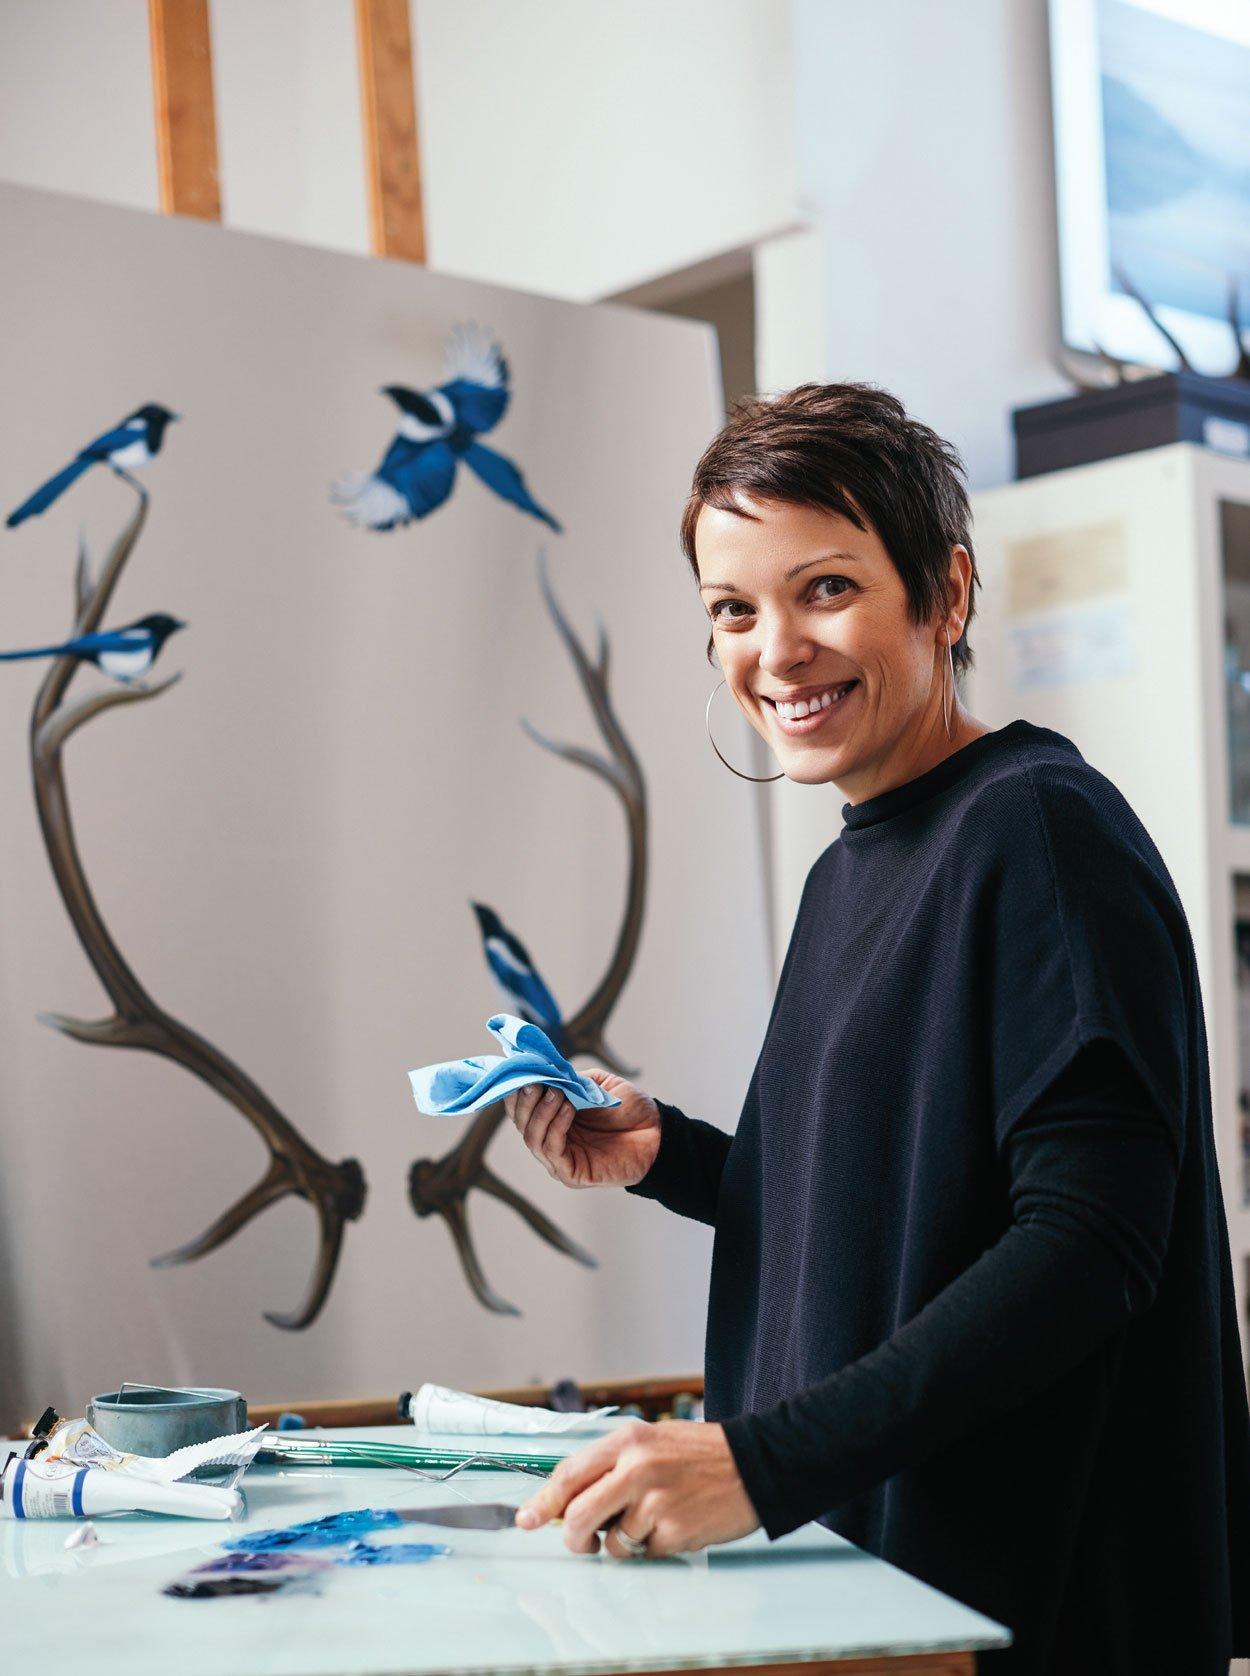 Mai Wyn Schantz in her studio.